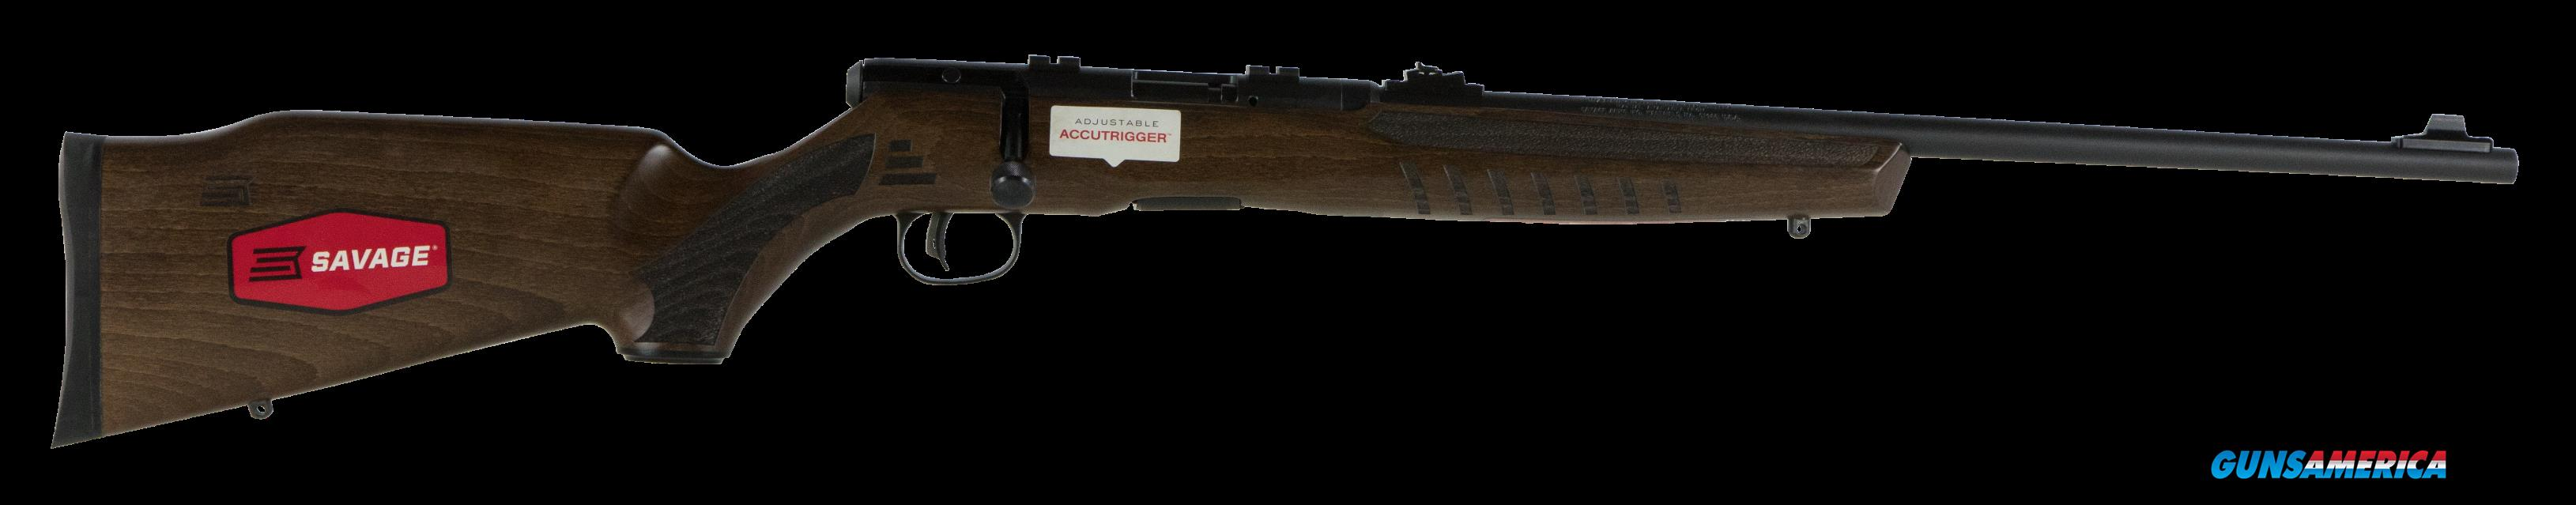 Savage B17, Sav 70810 B17g          17hmr Bolt  Guns > Pistols > 1911 Pistol Copies (non-Colt)